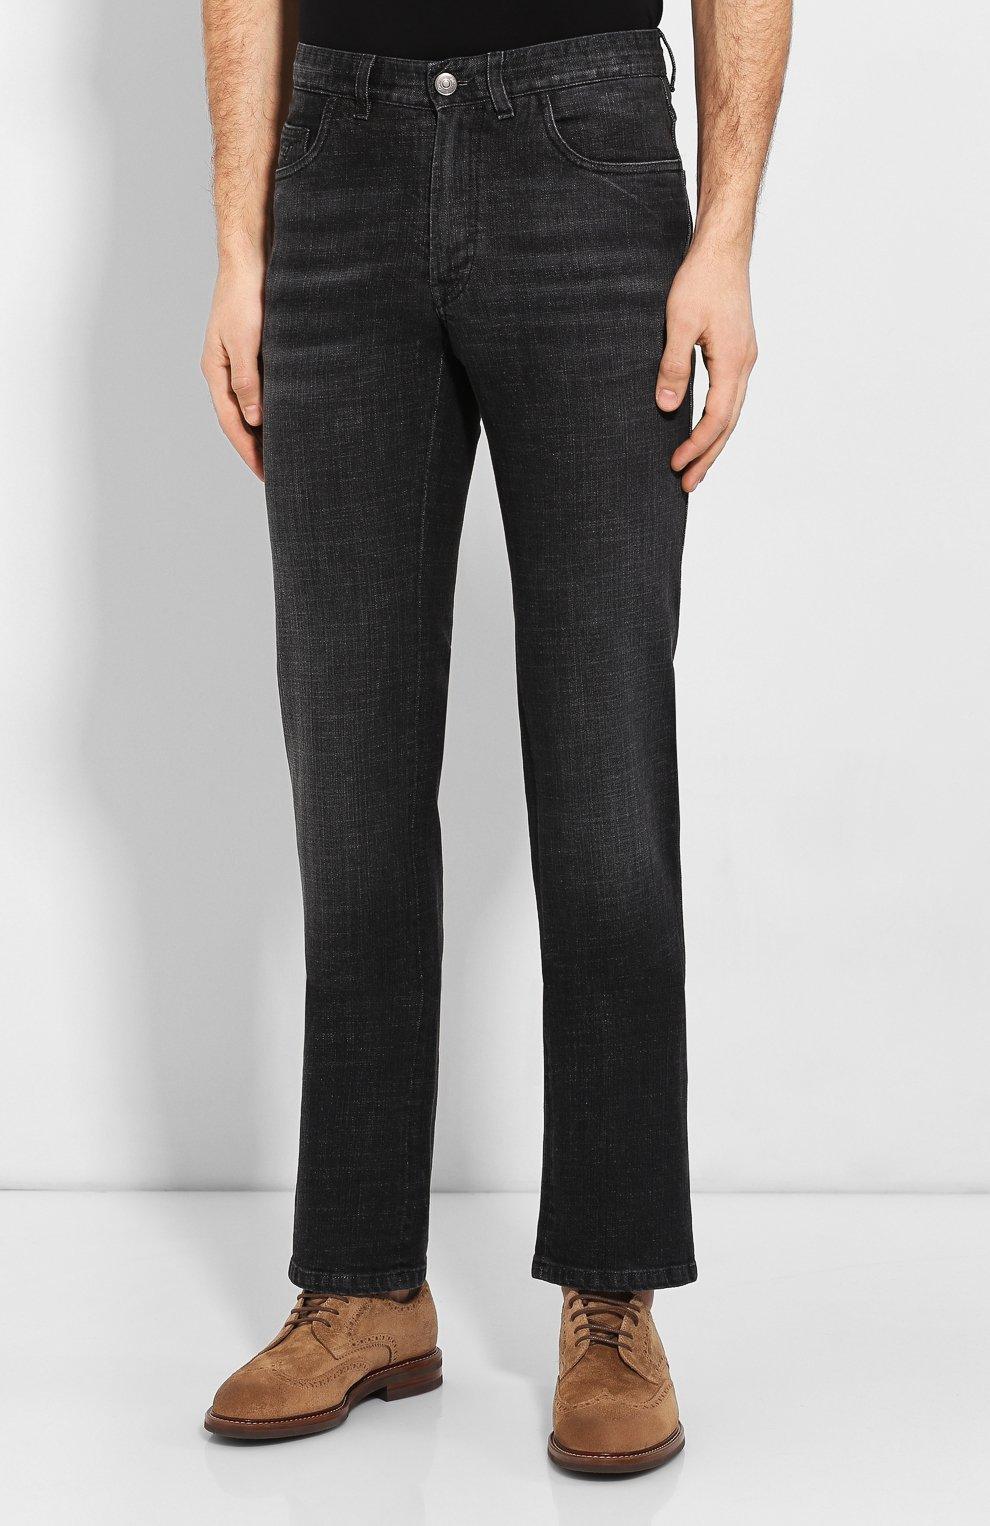 Мужские джинсы BRIONI черного цвета, арт. SPNJ0L/P9D12/STELVI0 | Фото 3